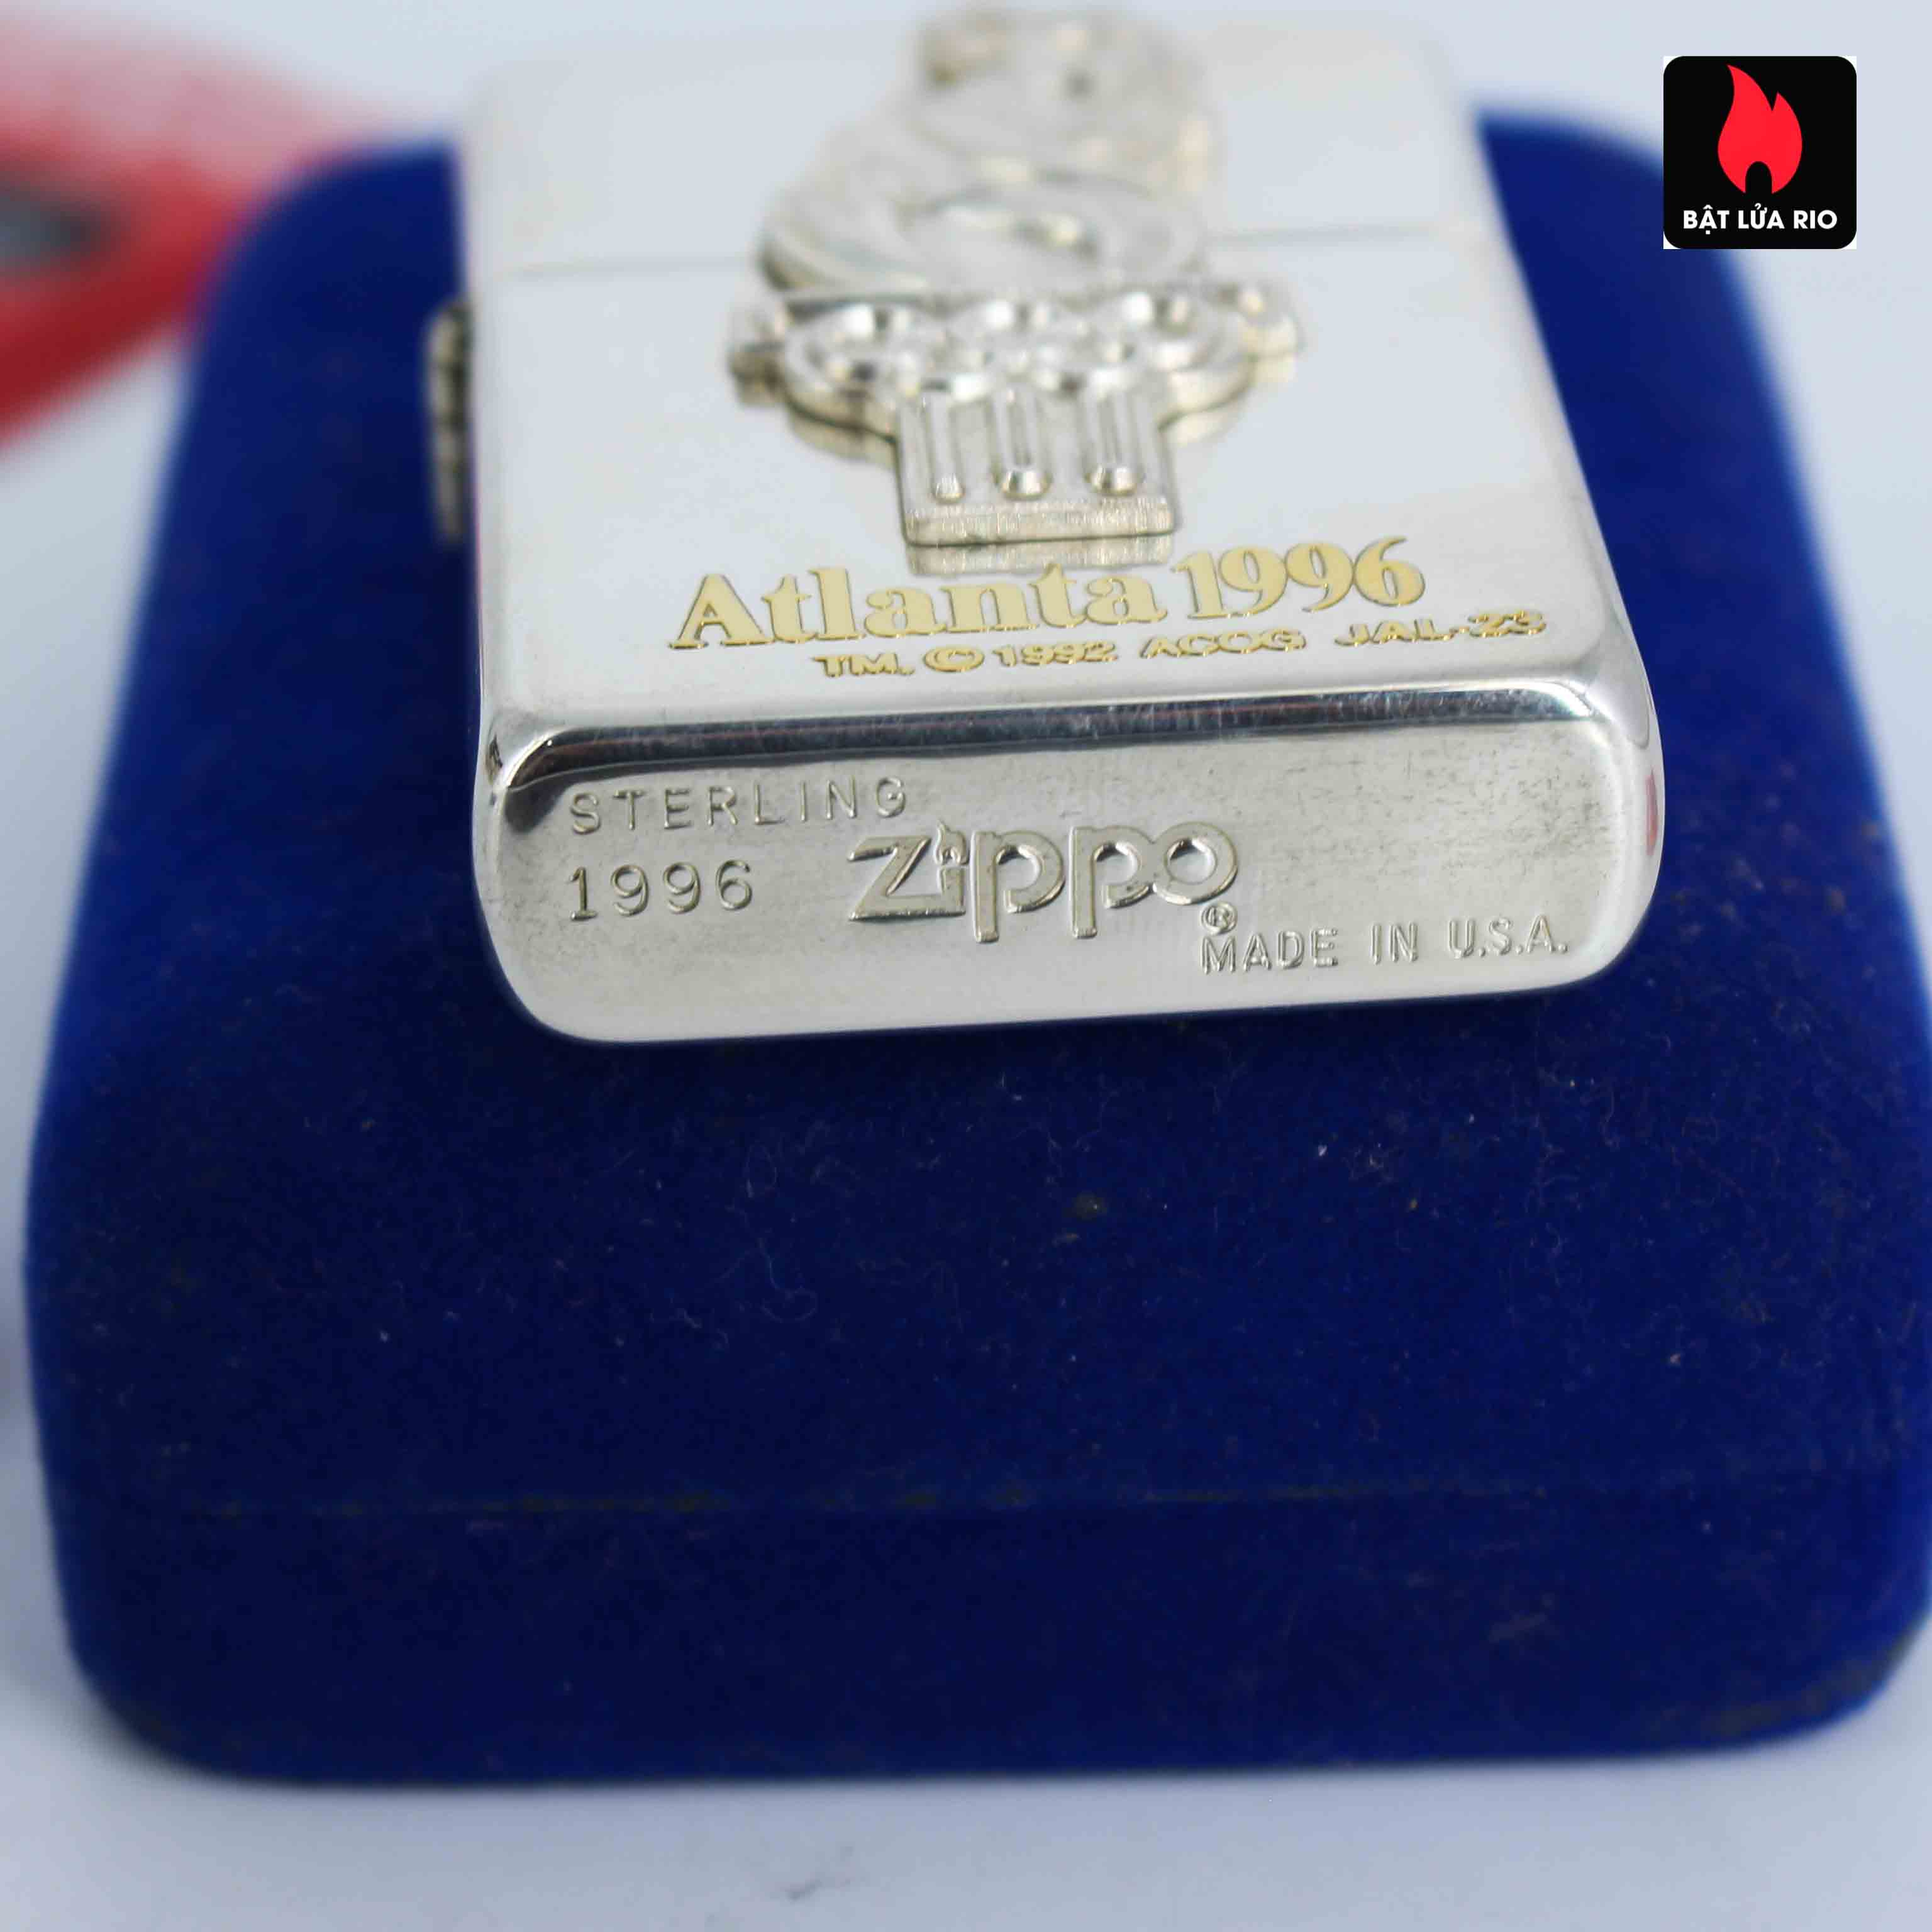 Zippo La Mã 1996 - Sterling Silver - Atlanta 1996 7